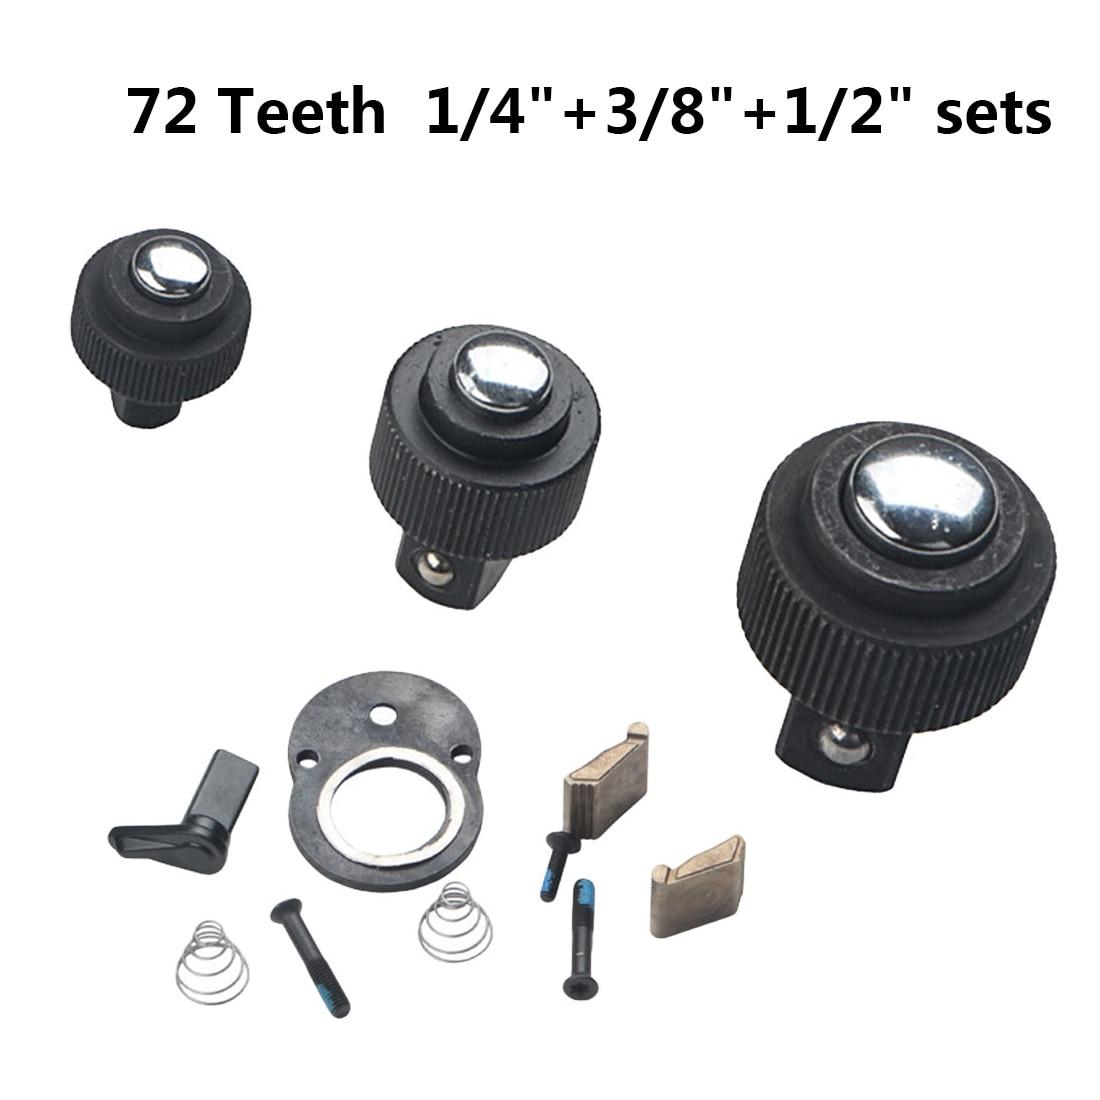 Ratchet Wrench Part Kit 1/4